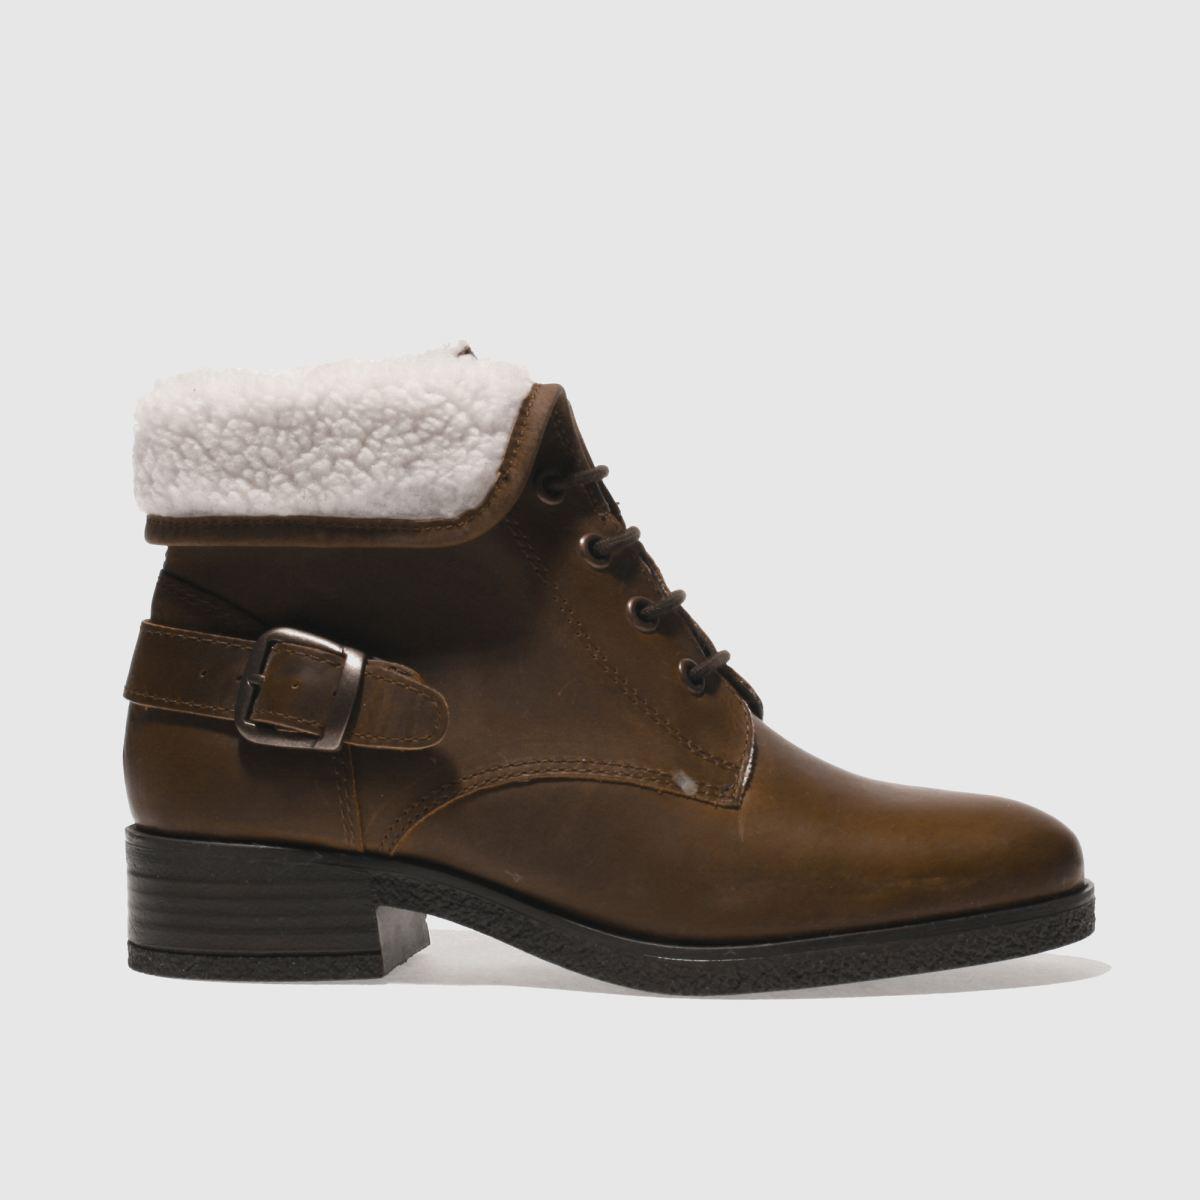 Schuh Brown Temptation Boots